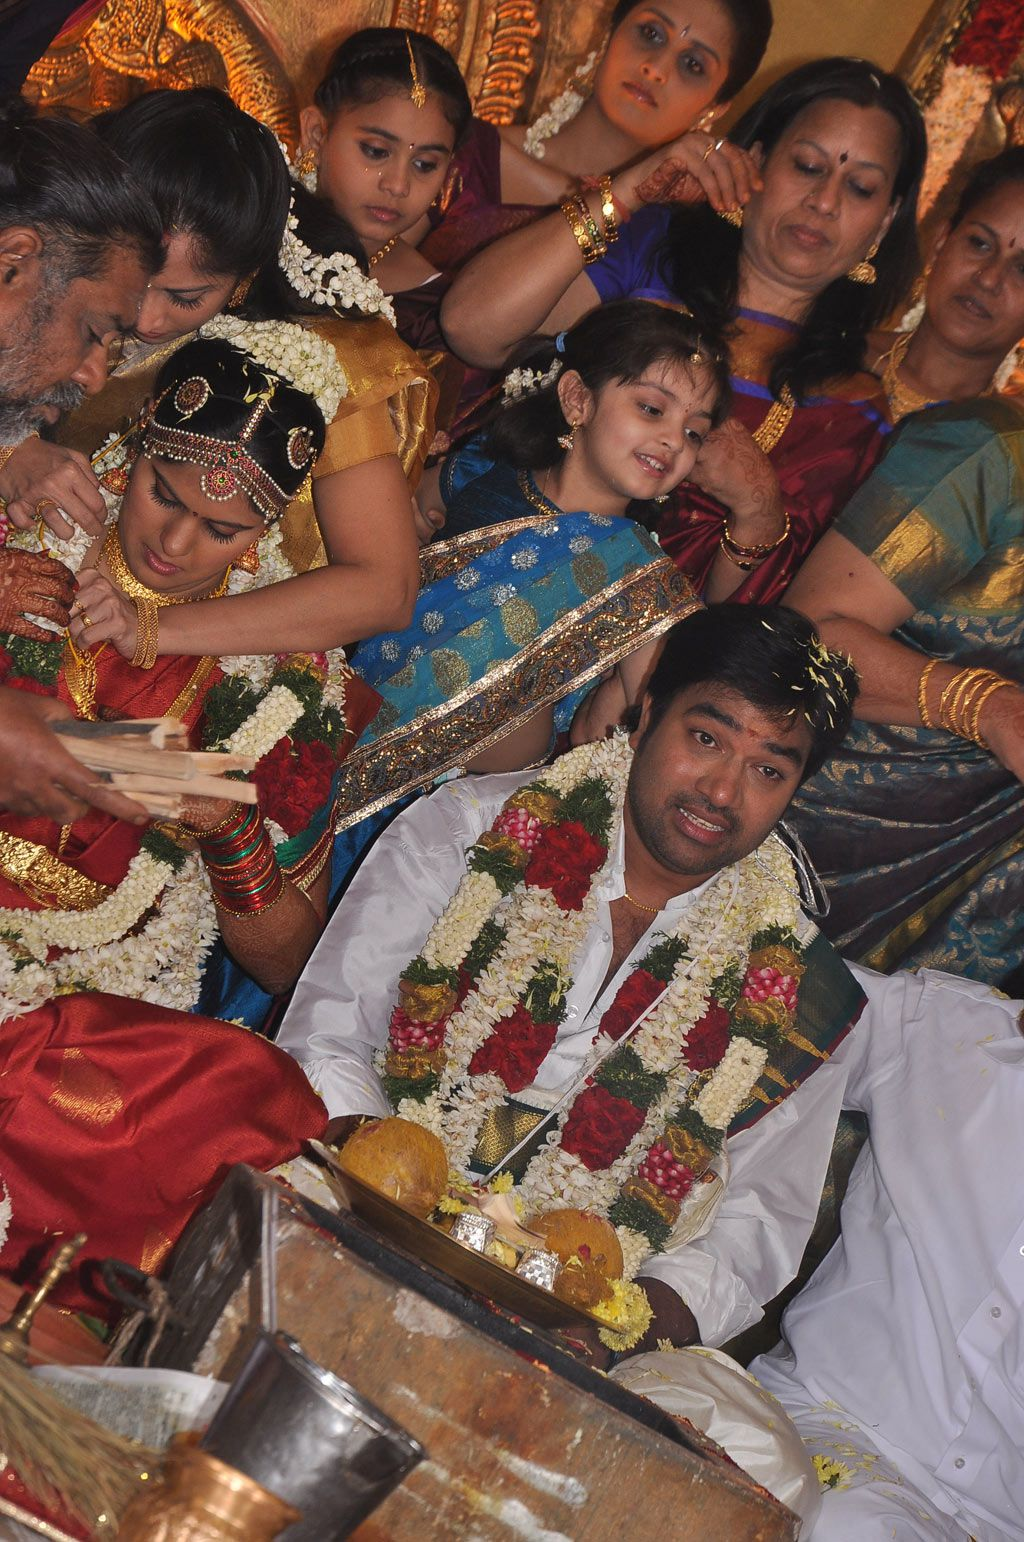 Photos Of Riteish Deshmukh Sachin Tendulkar Walk The Ramp Ajith sister wedding pictures